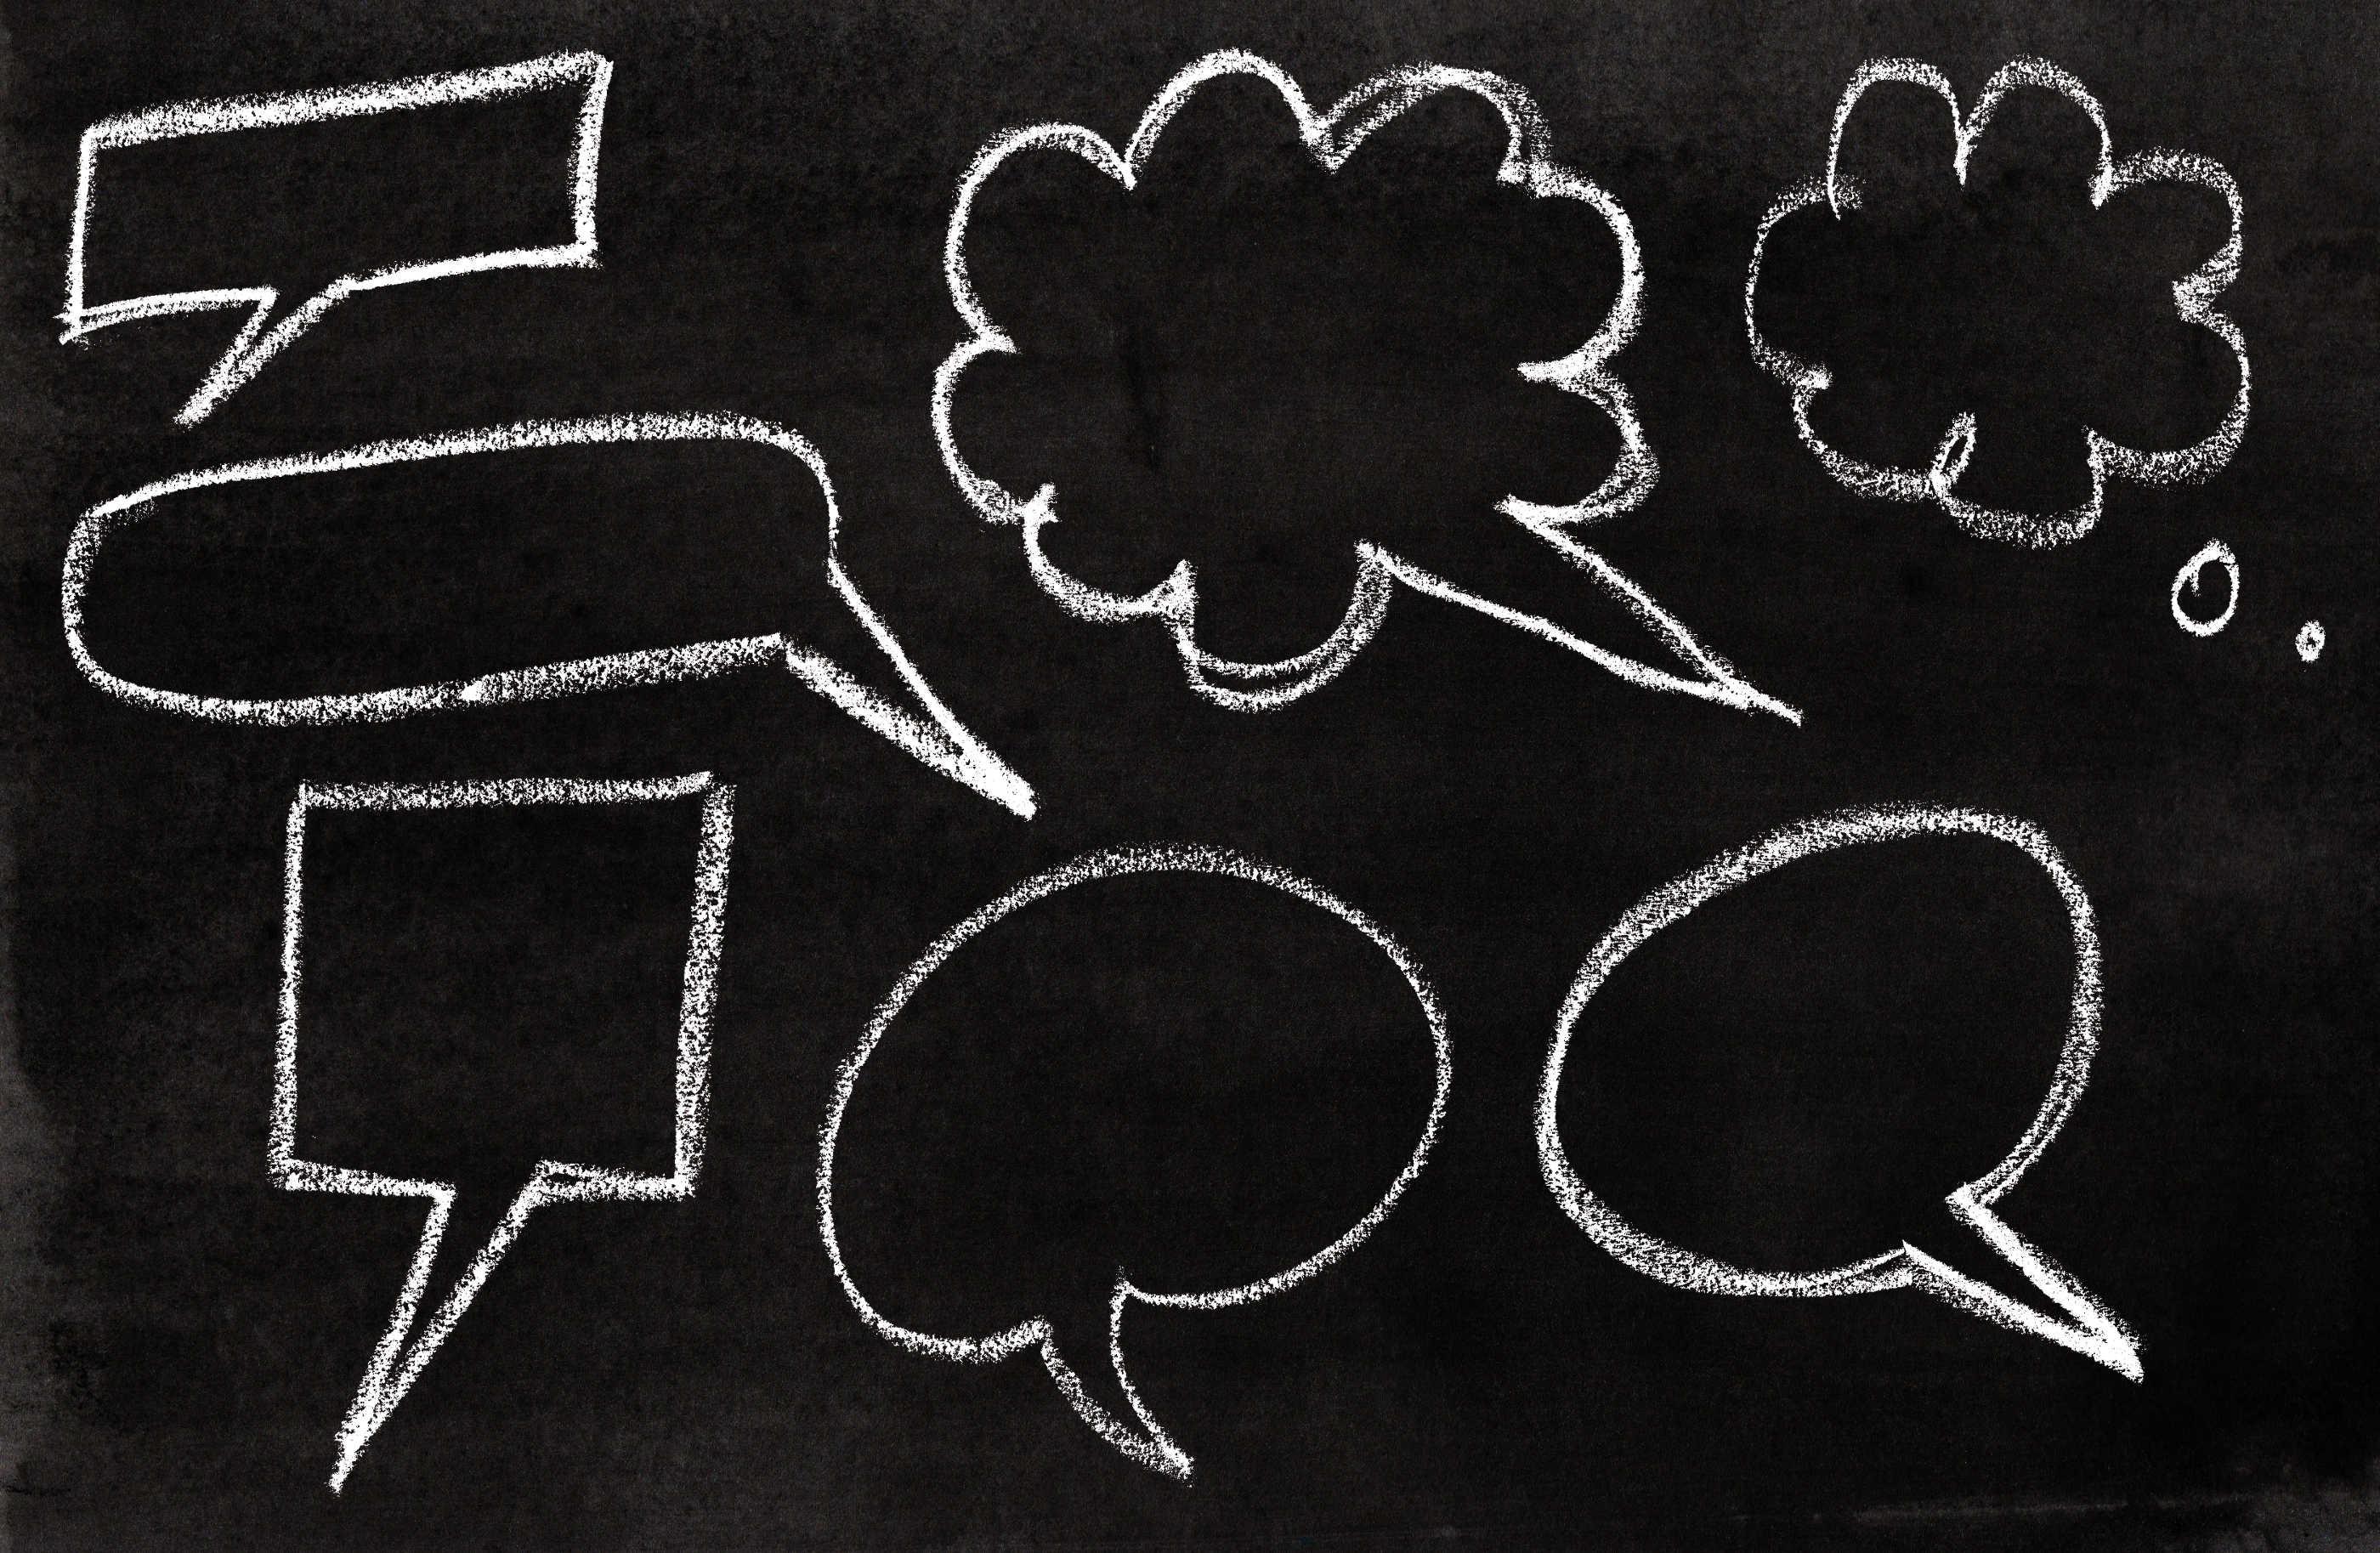 7-chalk-speech-bubble-cover.jpg